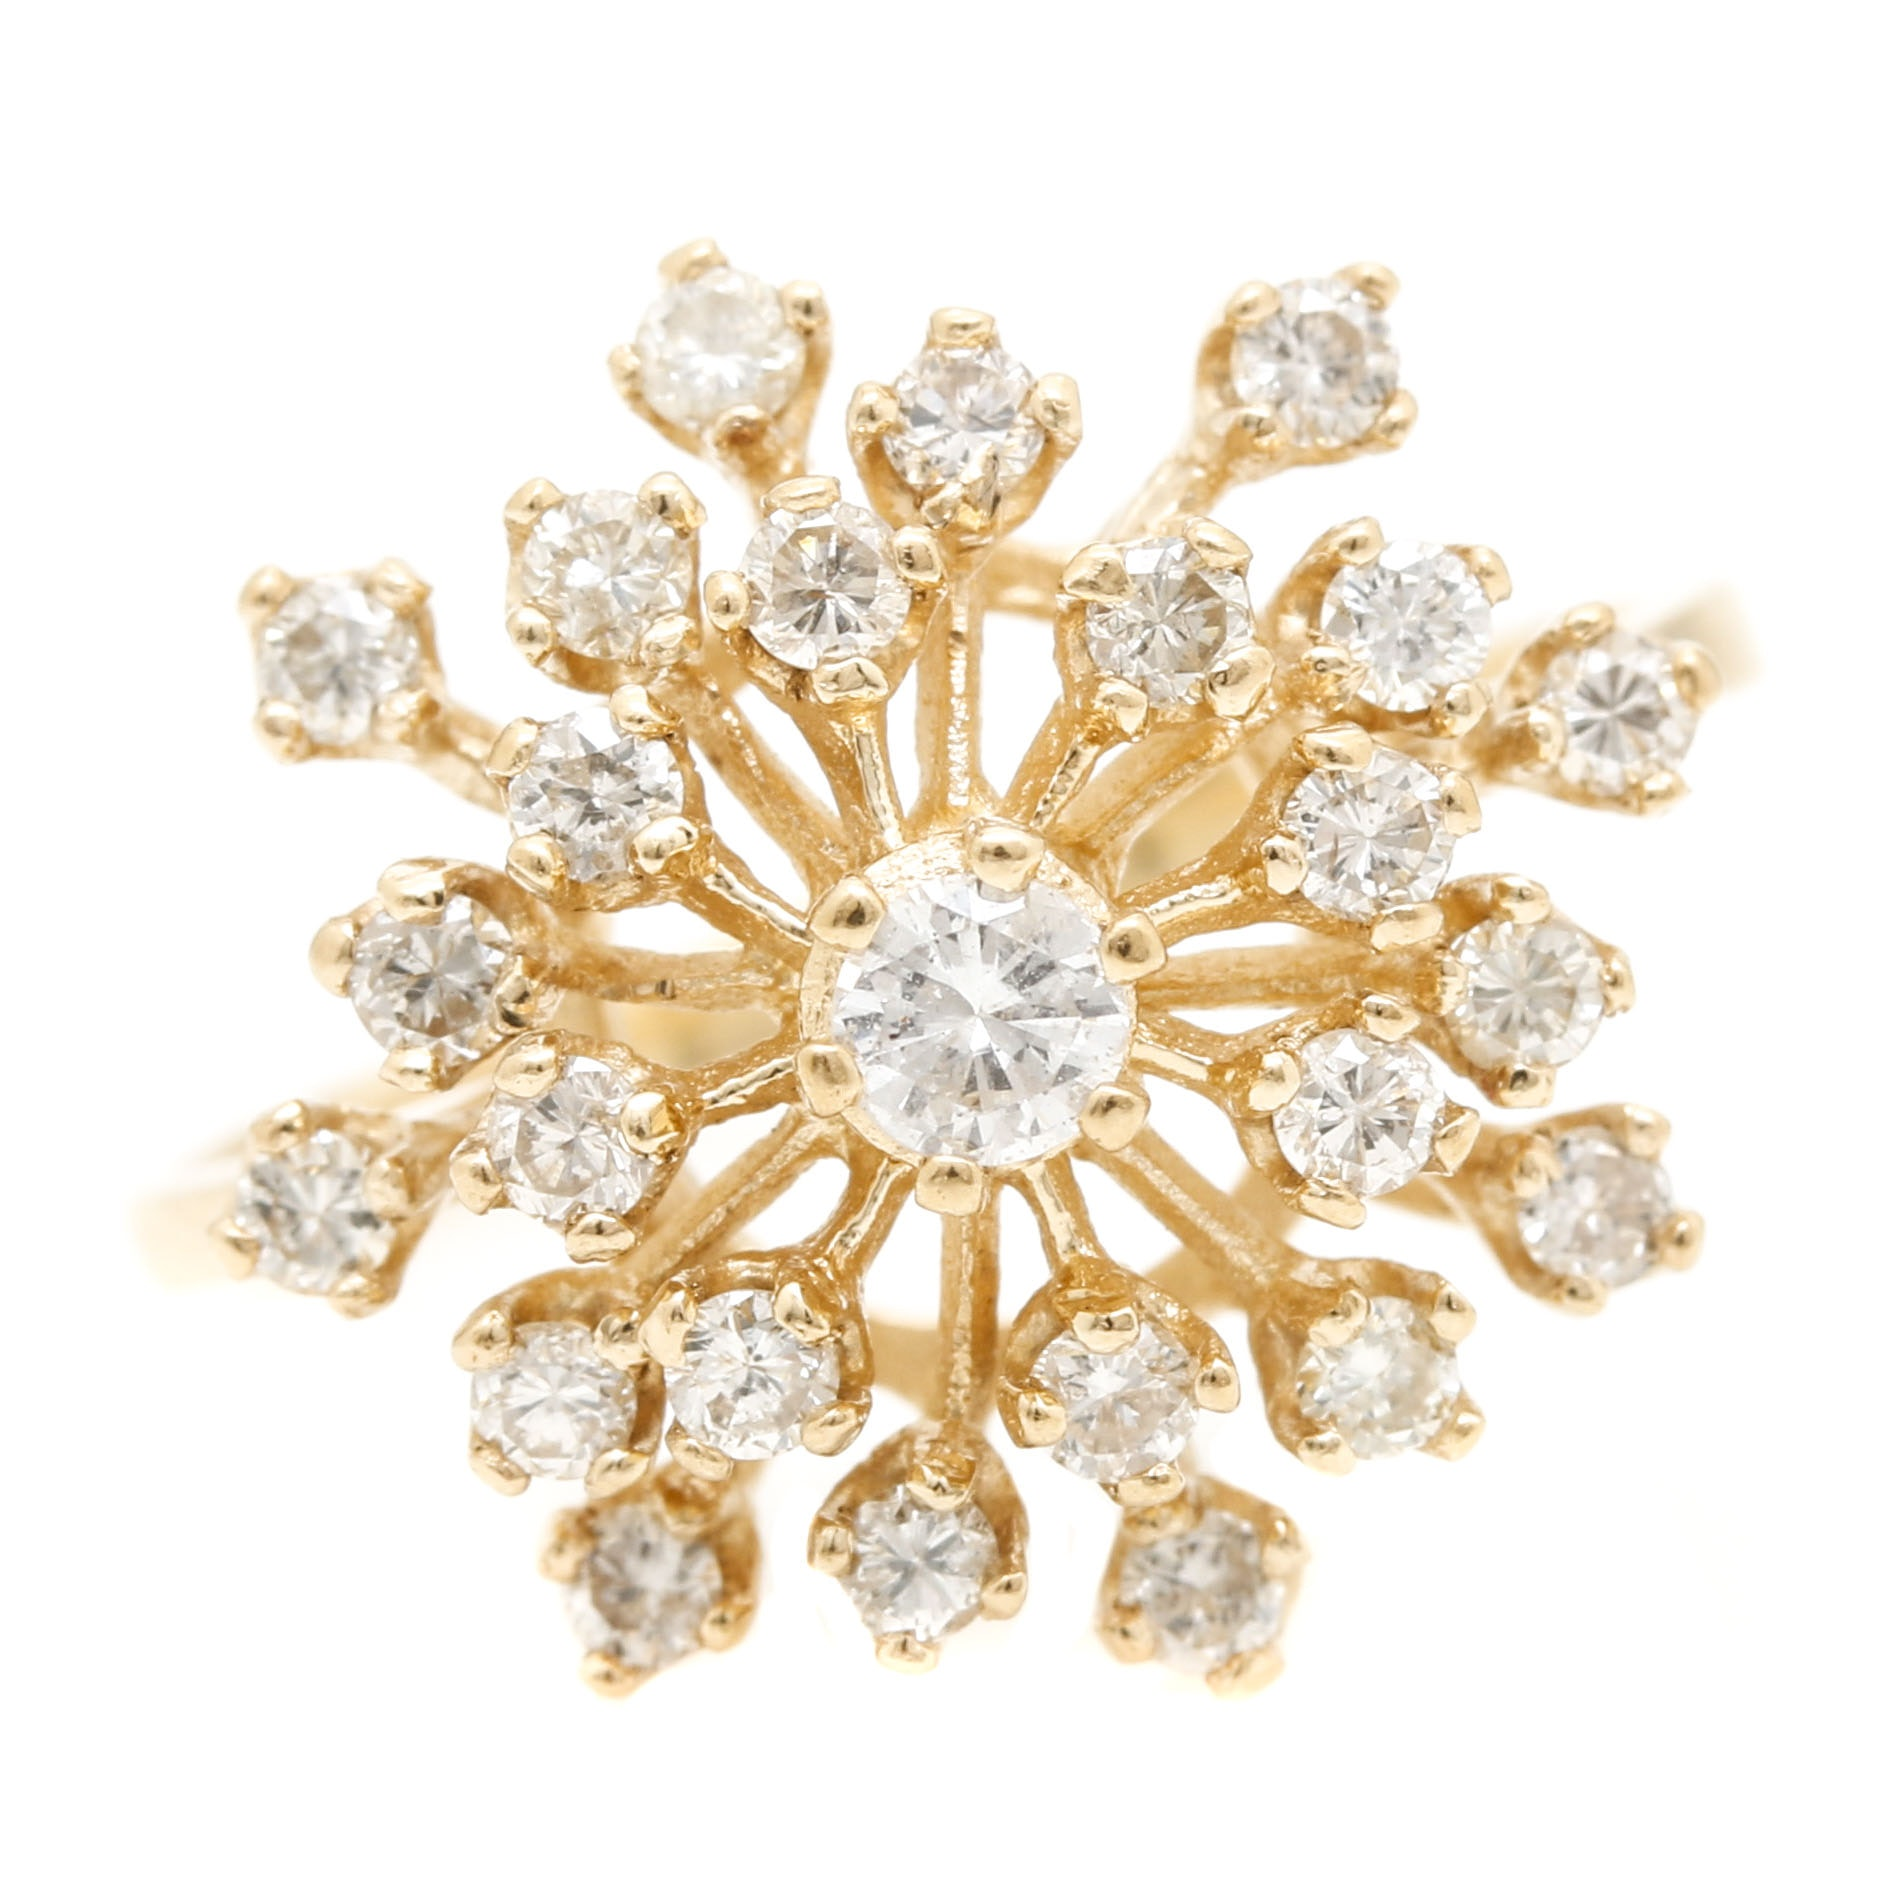 14K Yellow Gold Diamond Starburst Cluster Ring